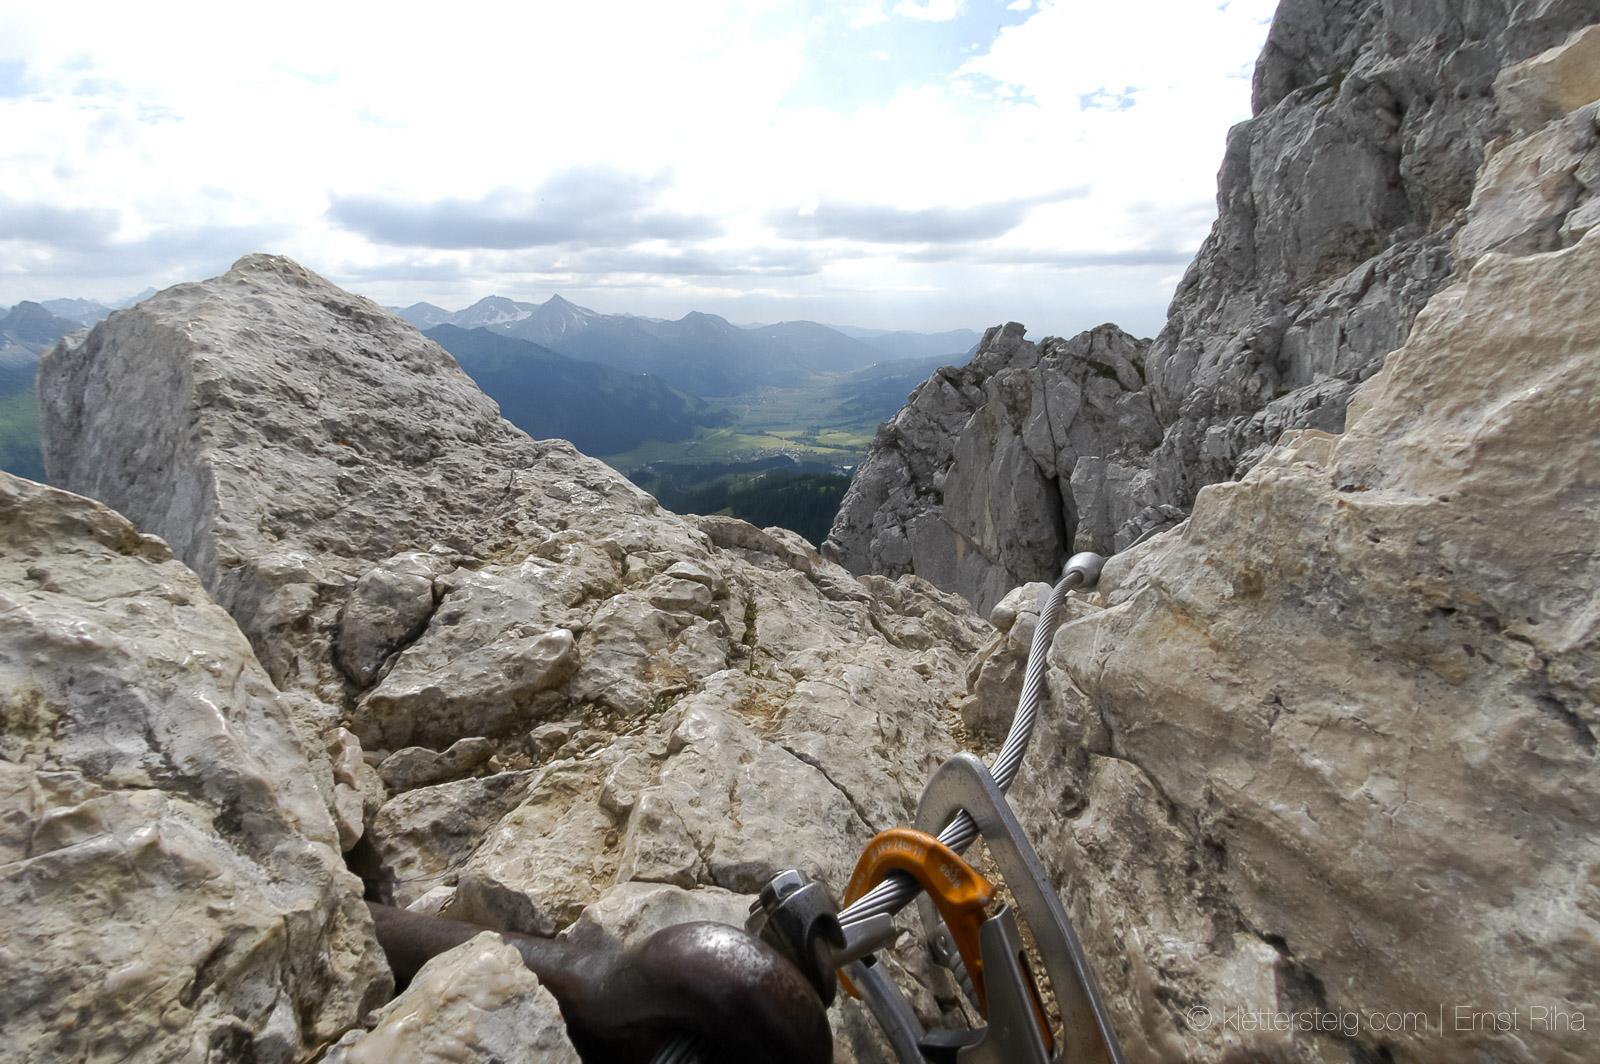 Friedberger Klettersteig : Rote flüh friedberger klettersteig klettersteige